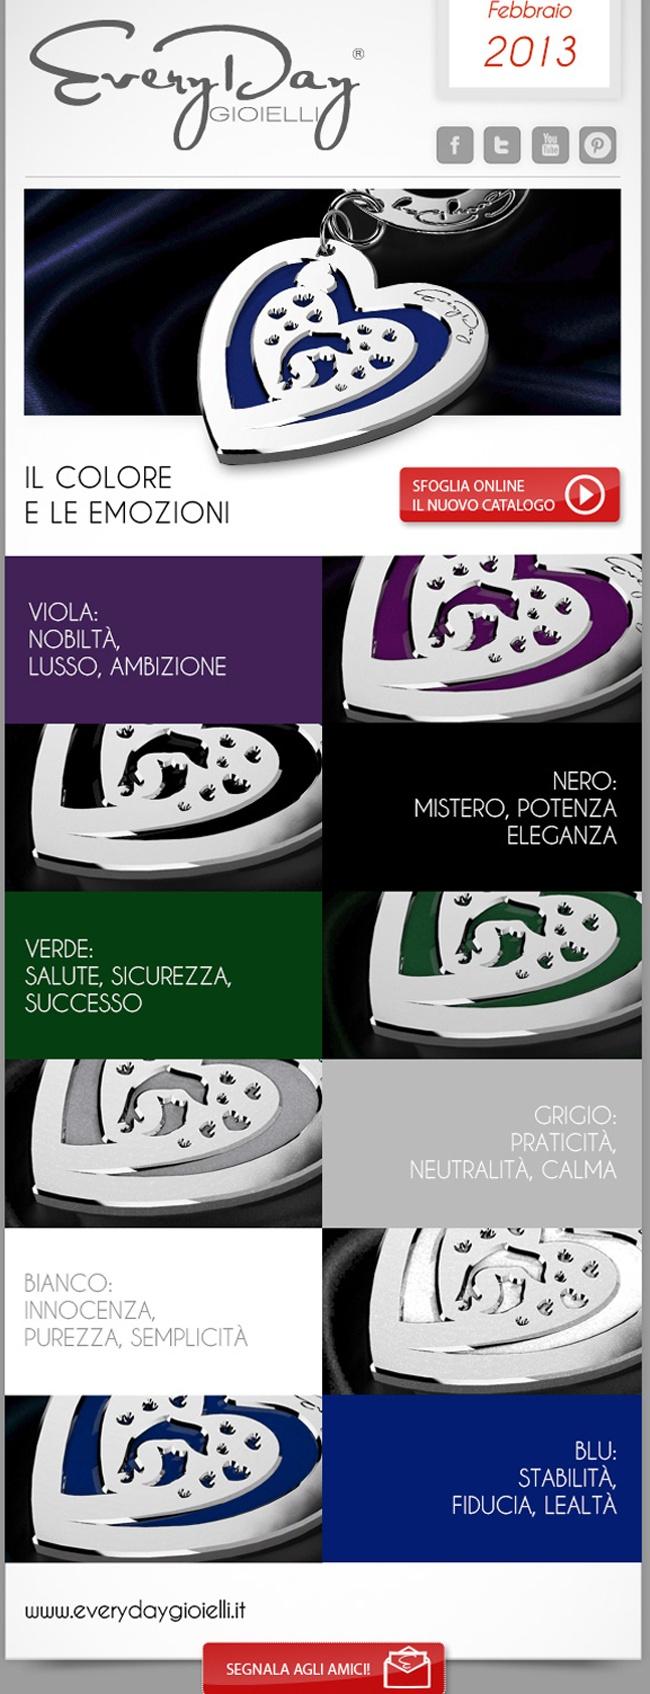 #cuore #argento #heart #silver #everydaygioielli #style #woman #girl    http://www.everydaygioielli.it/newsletter/2013/02/index.html